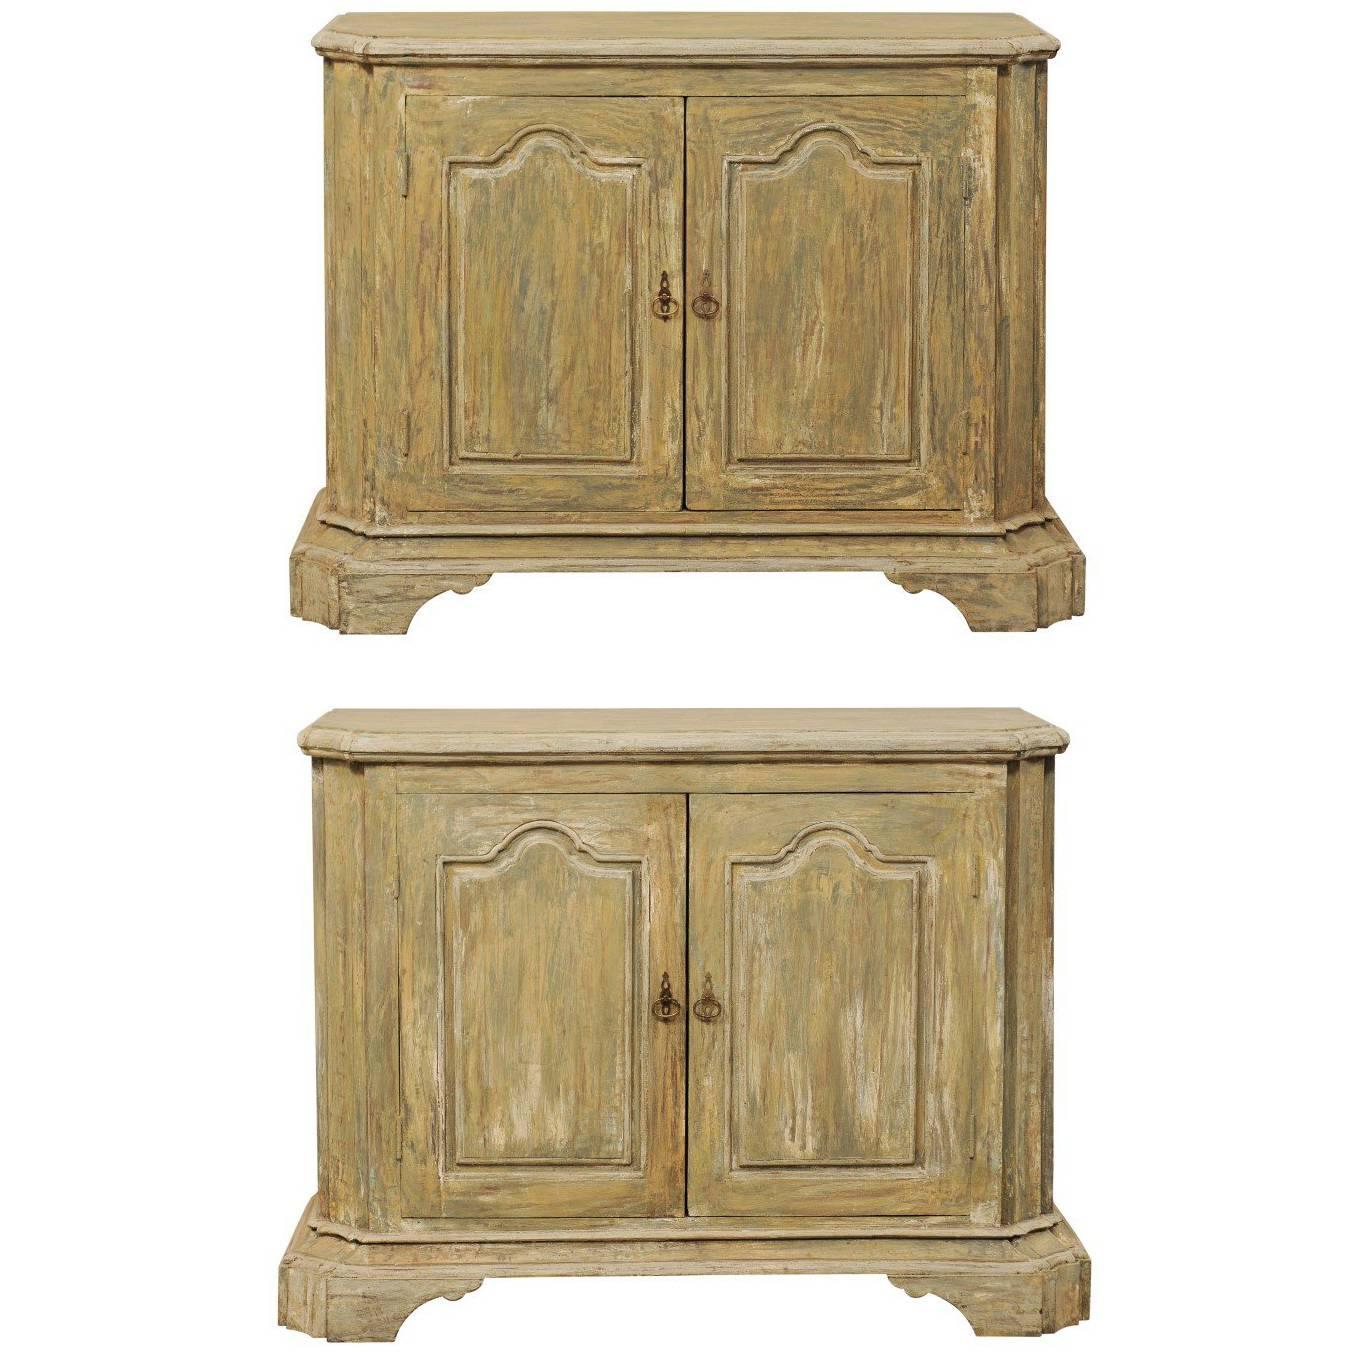 Pair of Custom American Two-Door Painted Wood Buffet Consoles with Bracket Feet